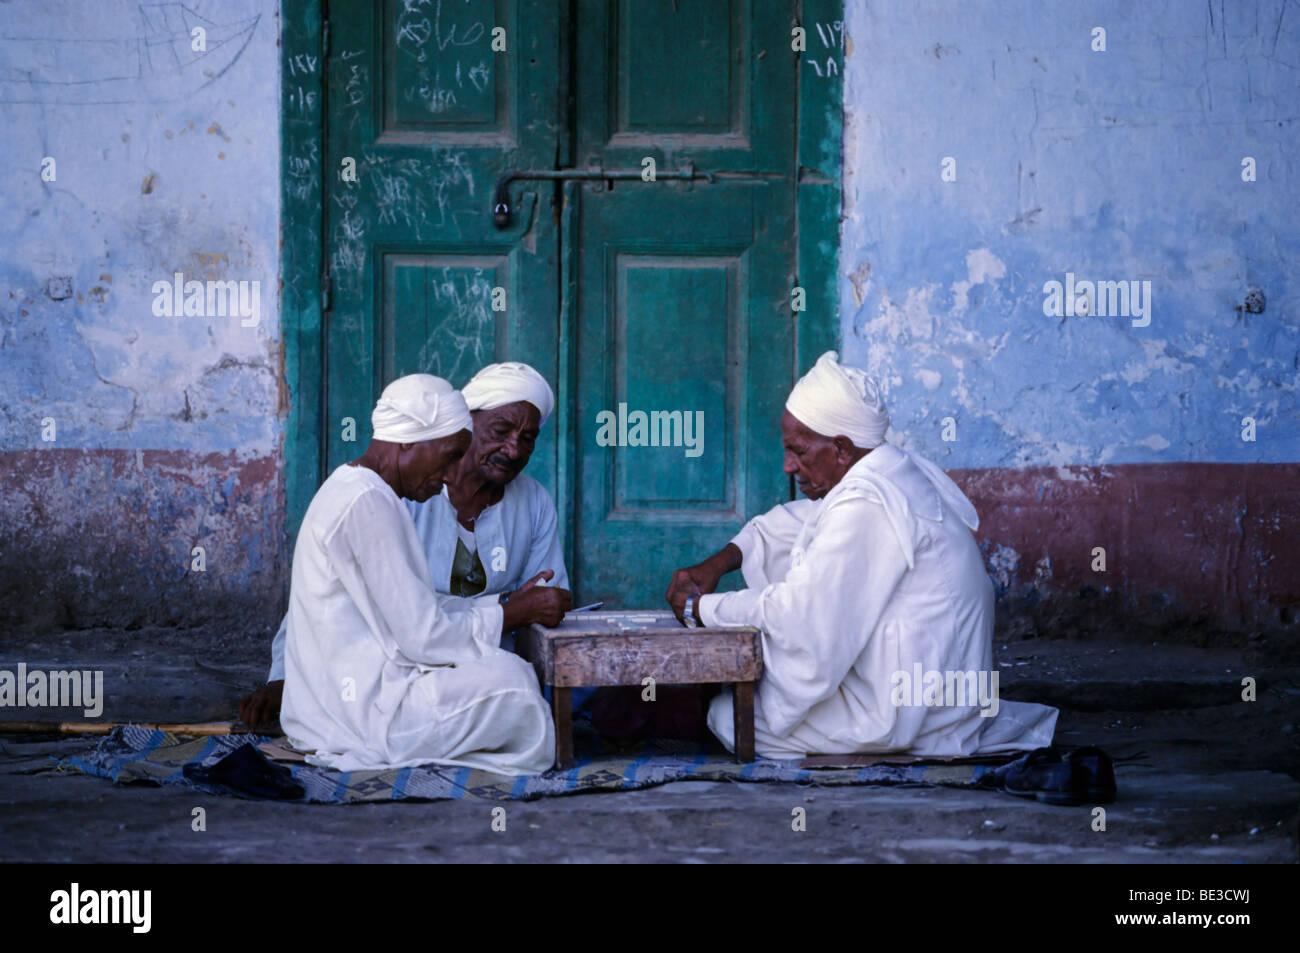 Egyptians playing dominos, play, men, game, gamblers, djellabea, white, traditional, turban, El Queseir, Egypt, - Stock Image